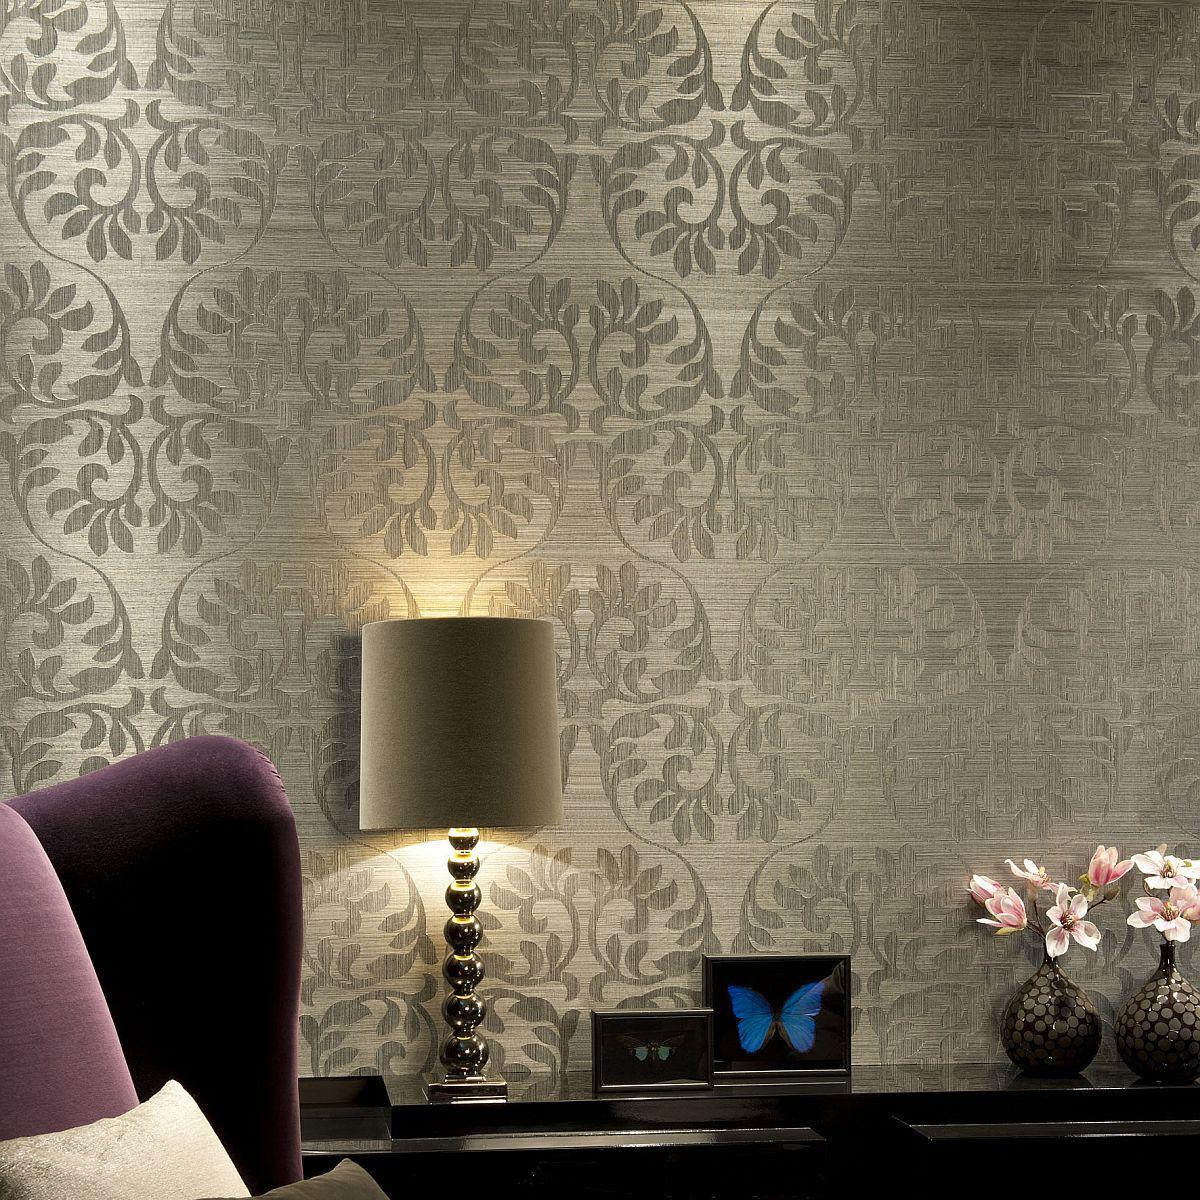 hochwertige tapeten und stoffe vlies sisal tapete leaf. Black Bedroom Furniture Sets. Home Design Ideas